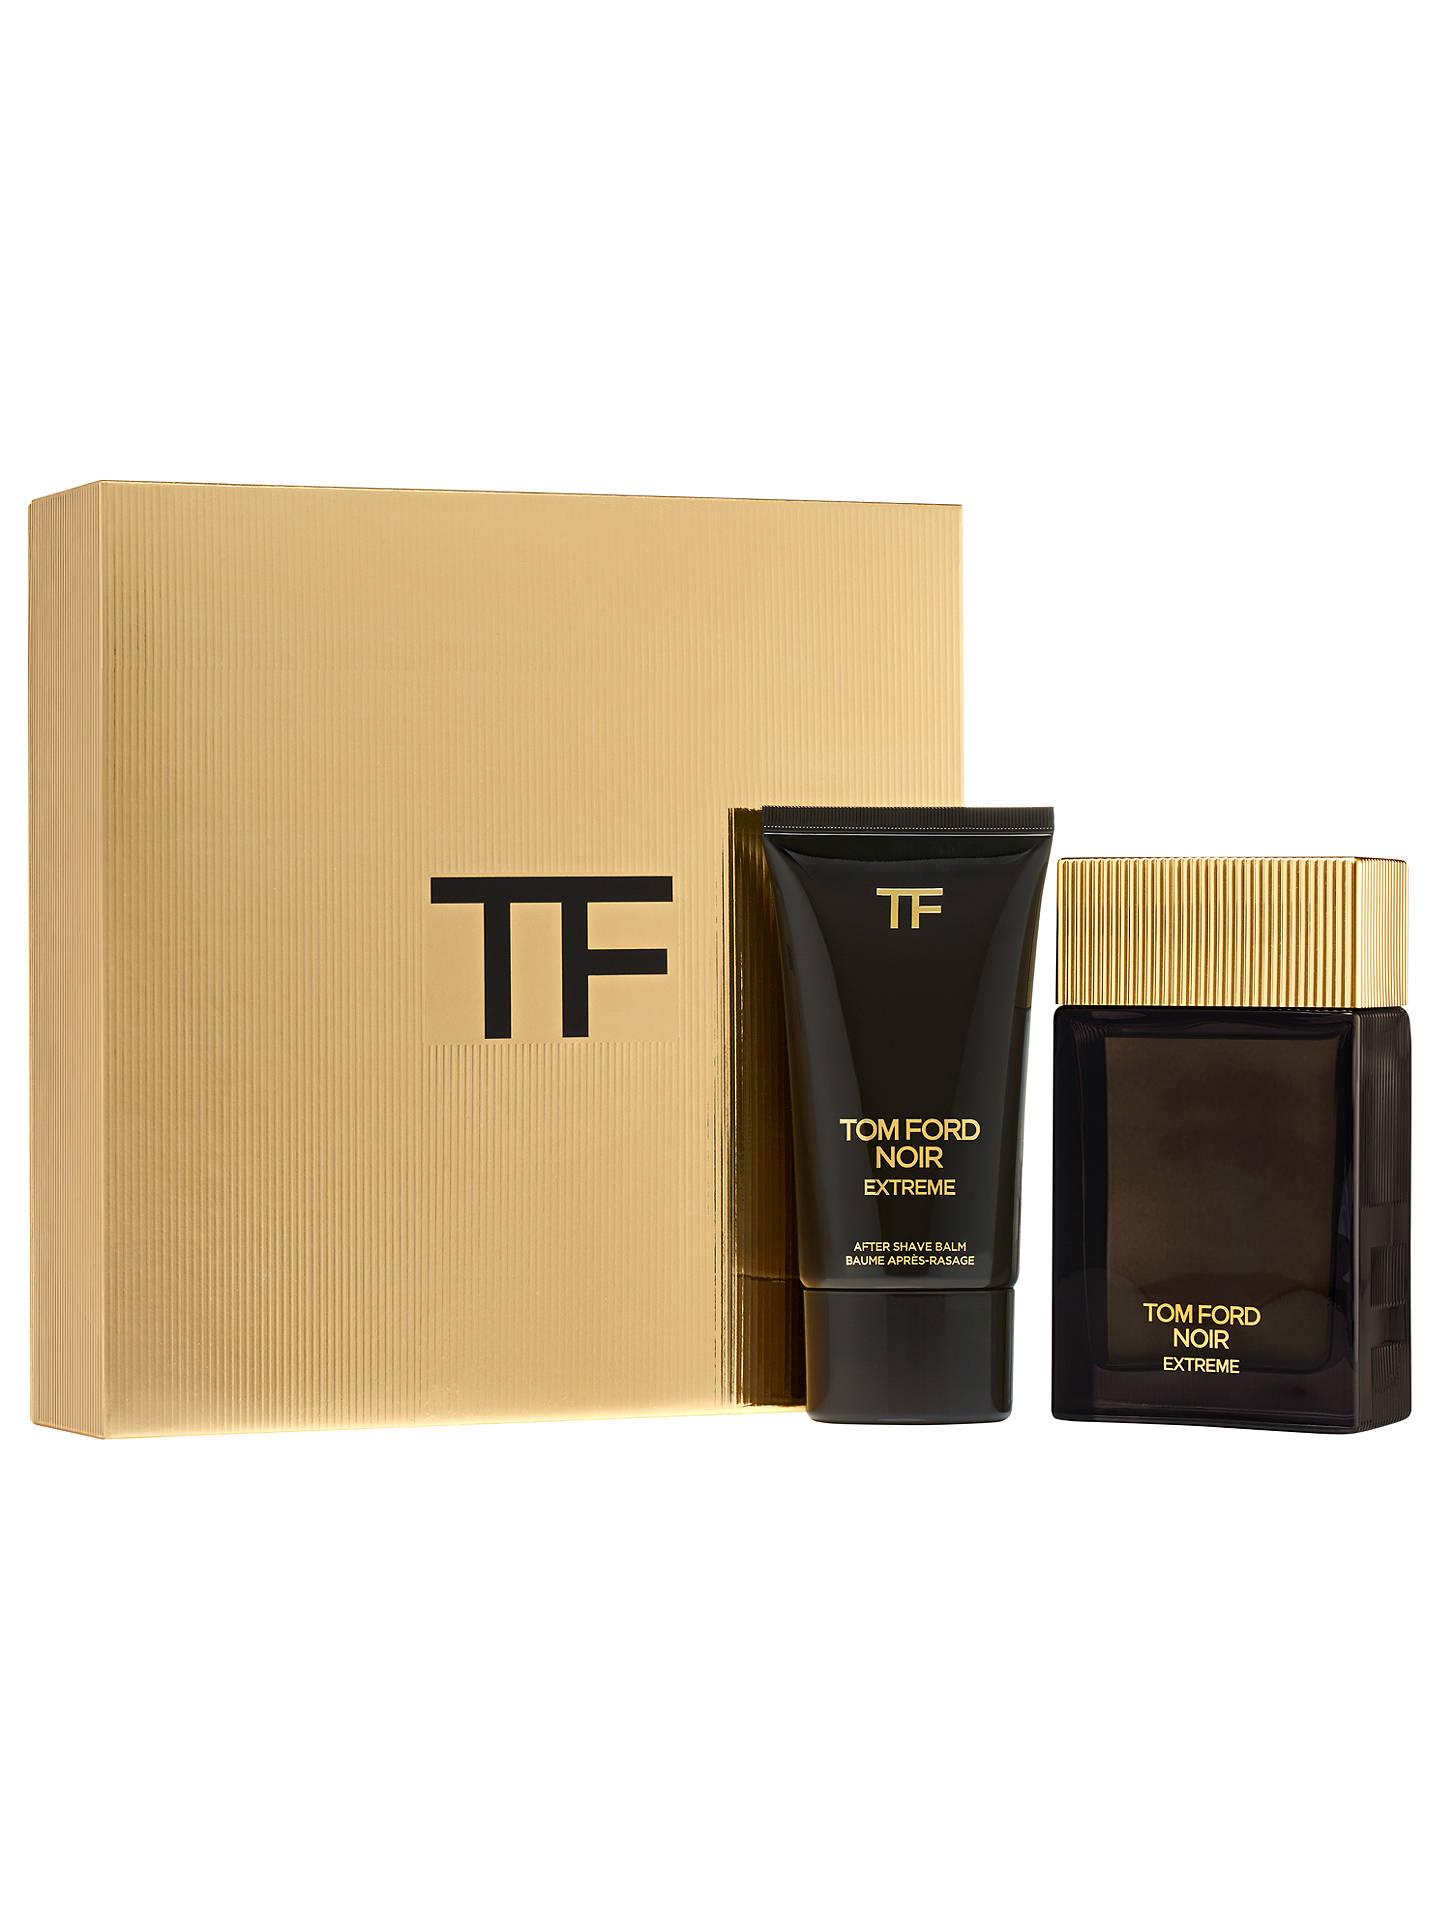 Fragrance Extreme Parfum De Gift Set John Tom At Eau Ford Noir 100ml DH2I9EW